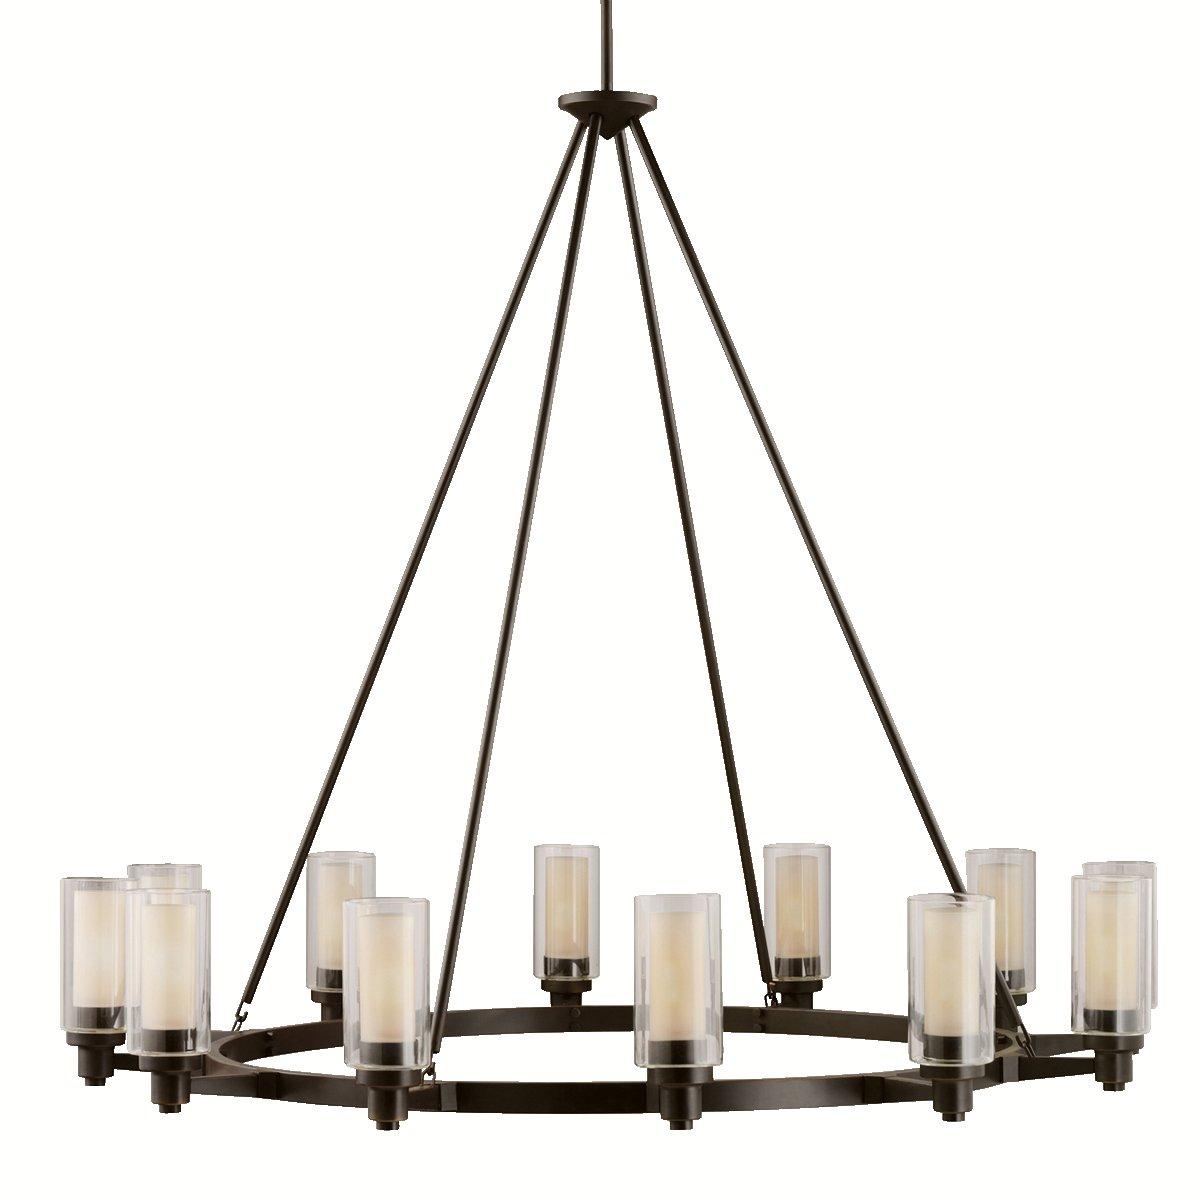 Kichler 2347oz 12 light chandelier amazon aloadofball Choice Image